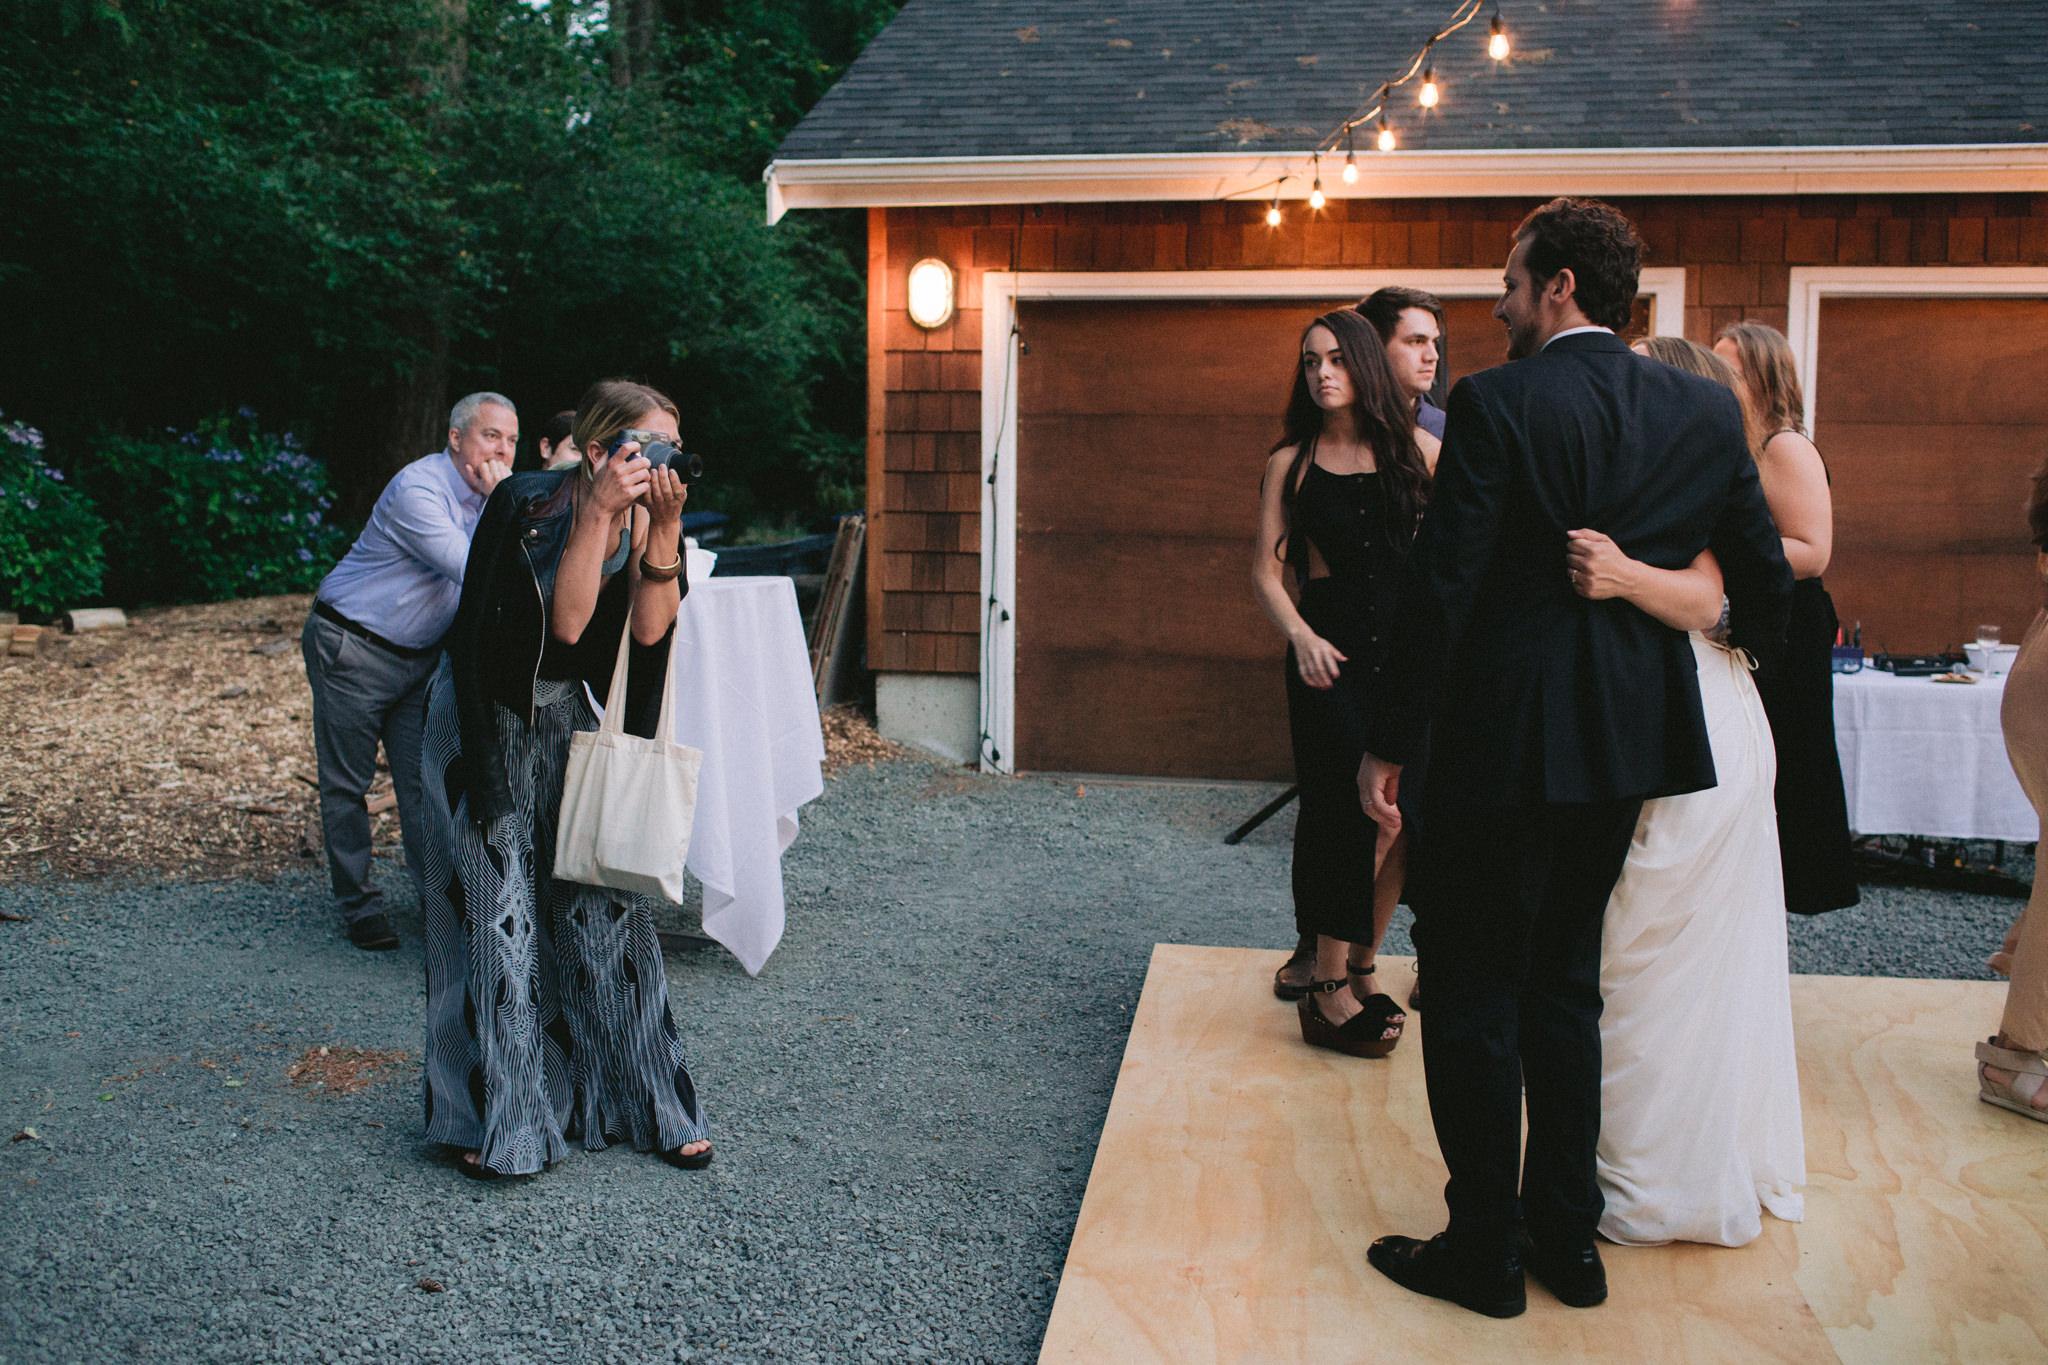 Backyard-Bainbridge-Island-Wedding-Alycia-Lovell-Photography-245.JPG